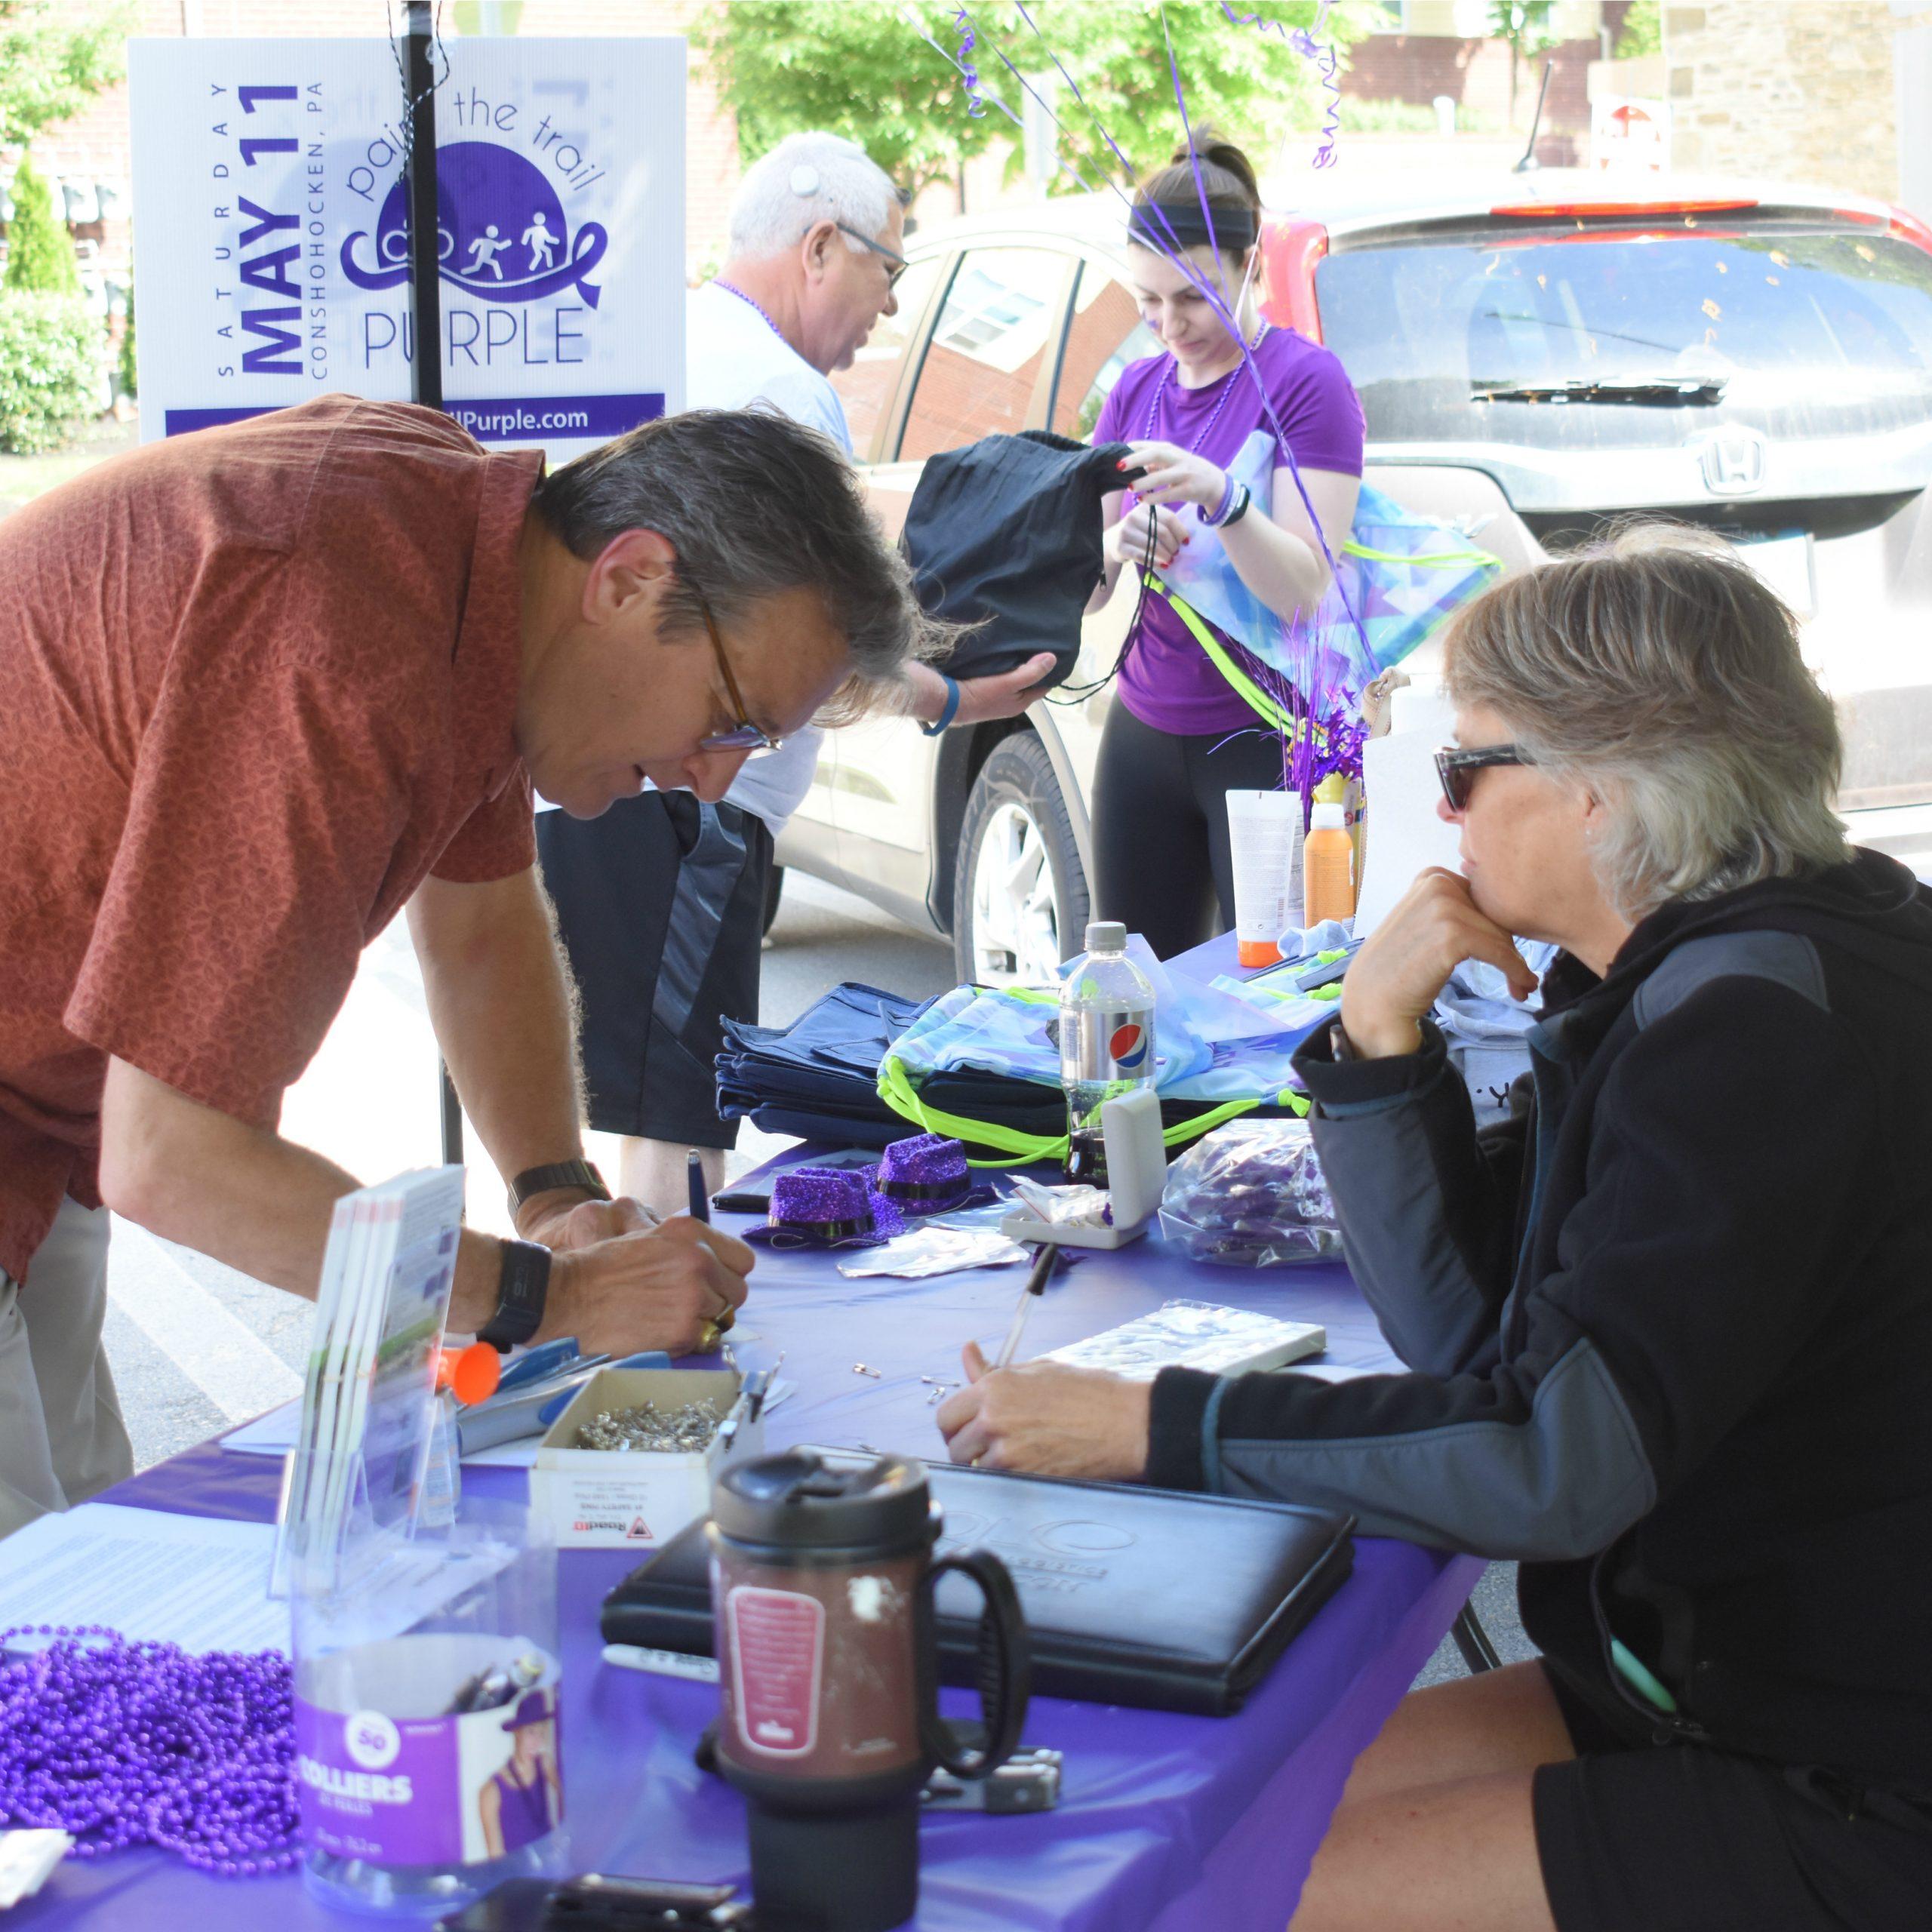 Paint The Trail Purple - Defeat Pancreatic Cancer